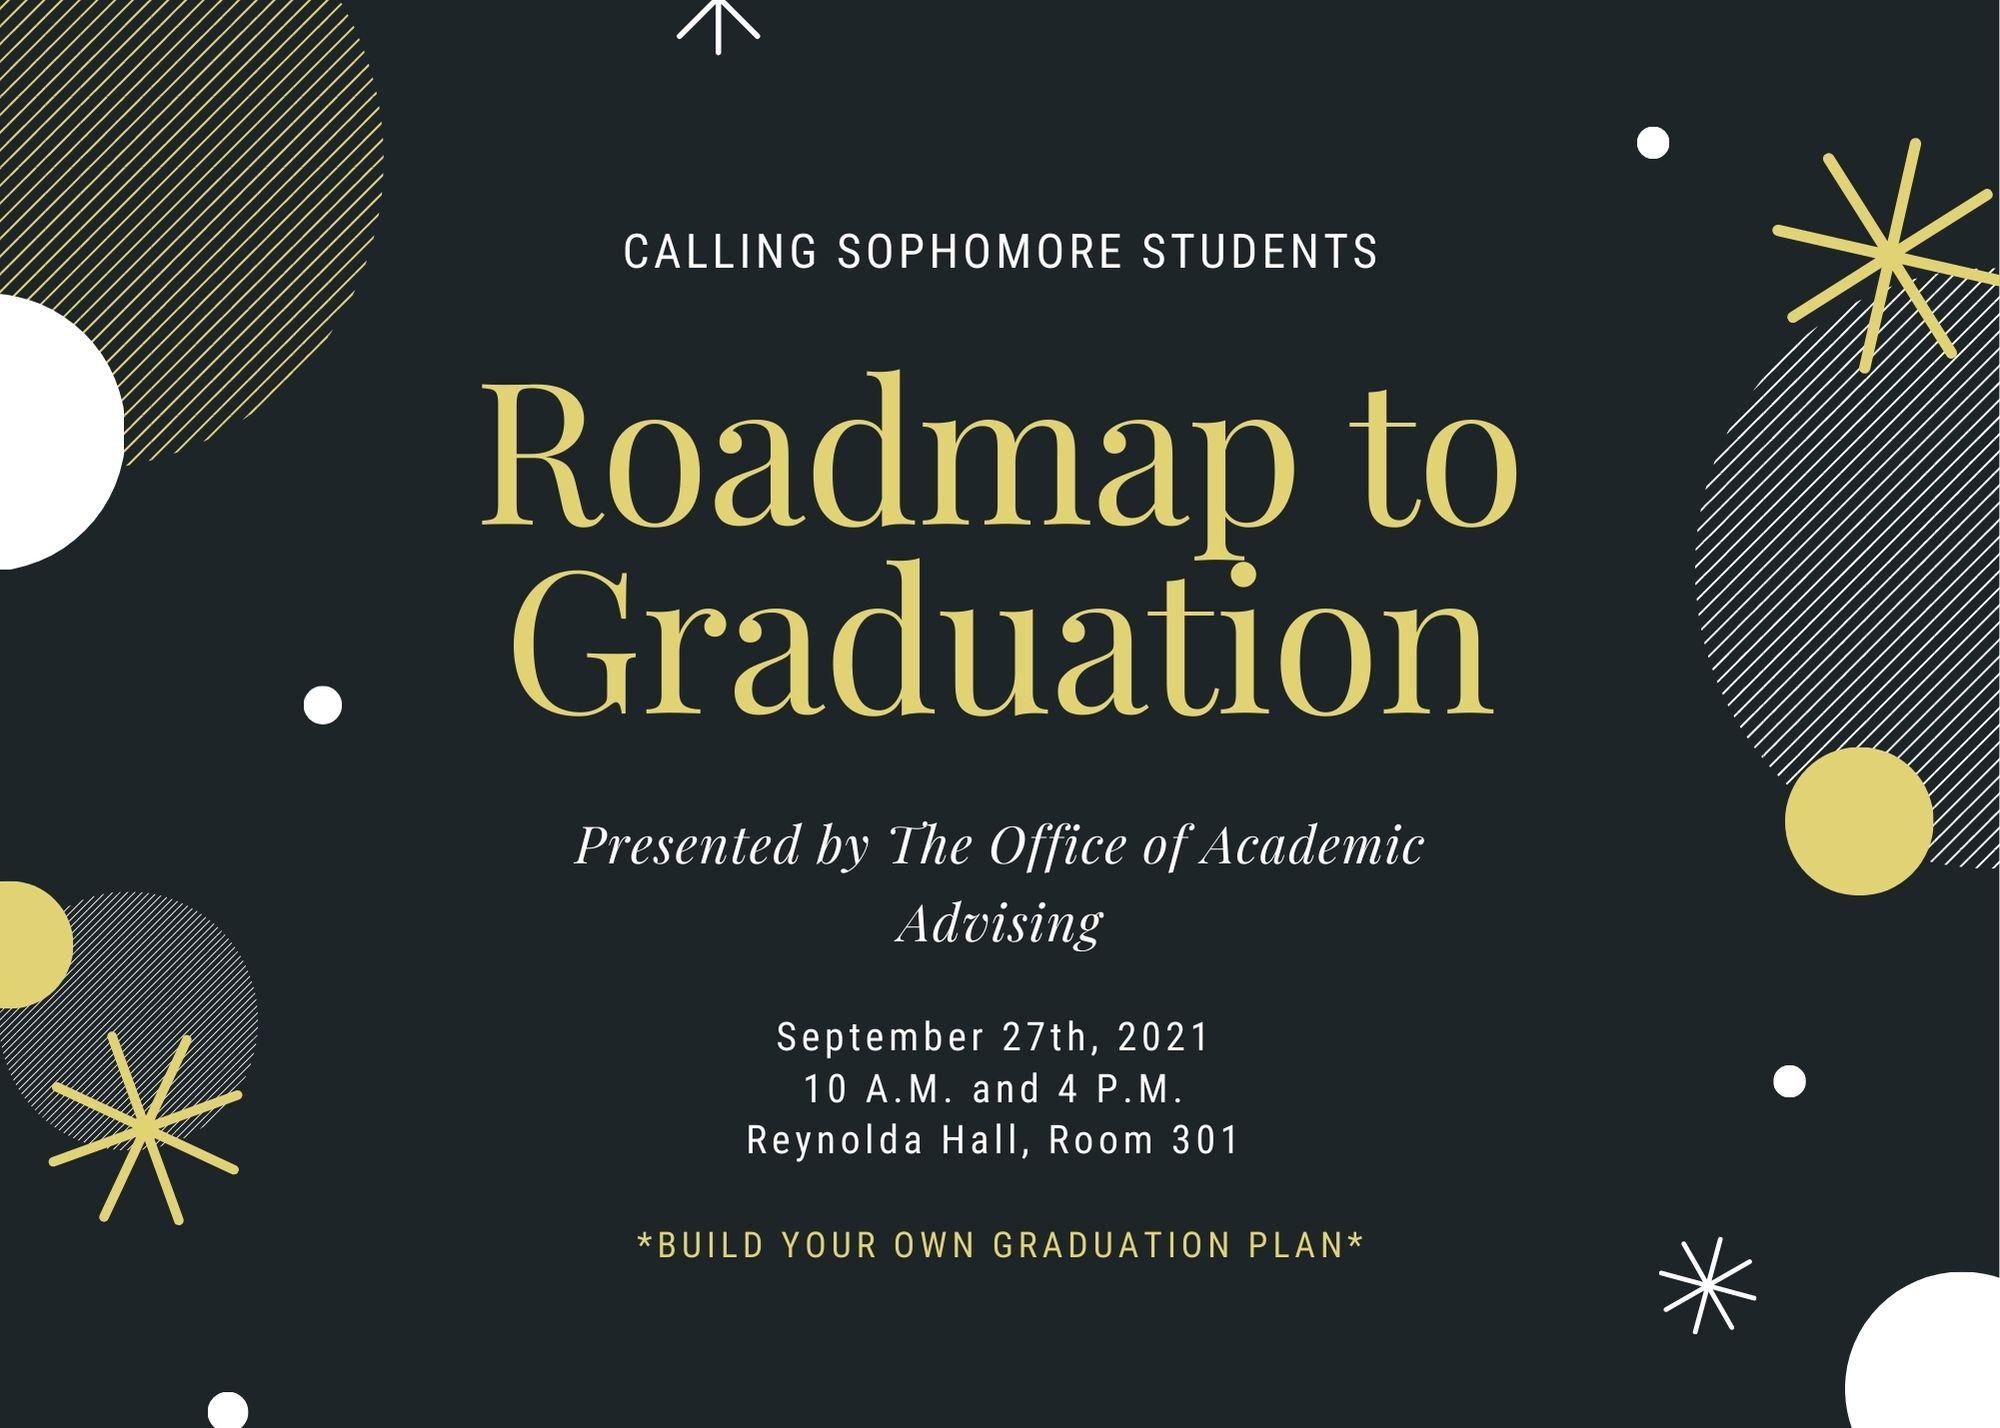 Roadmap to Graduation #2